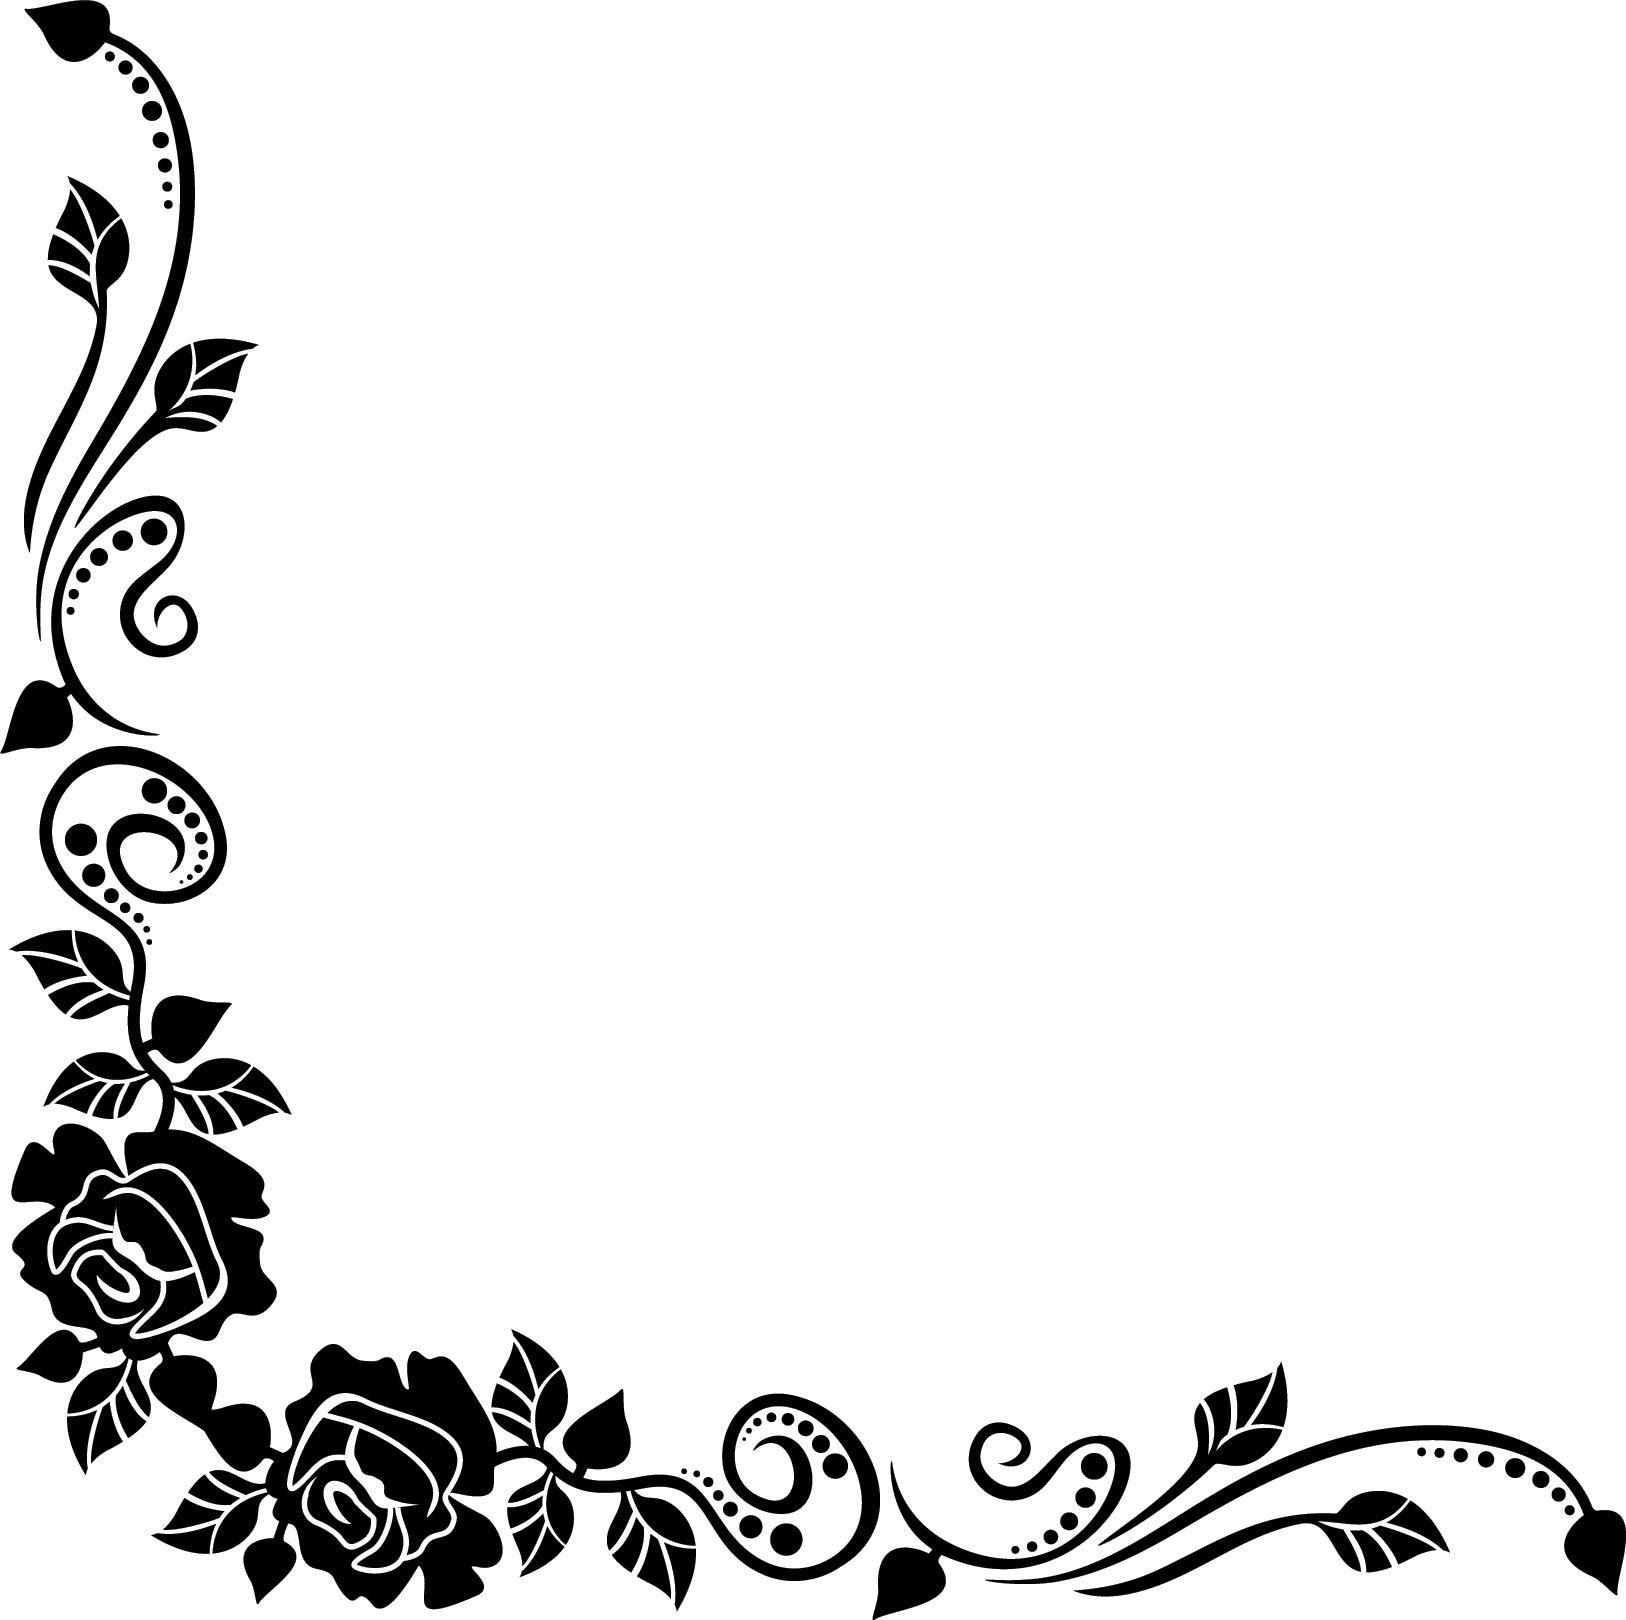 1626x1620 Silhouettes Flourish Flower